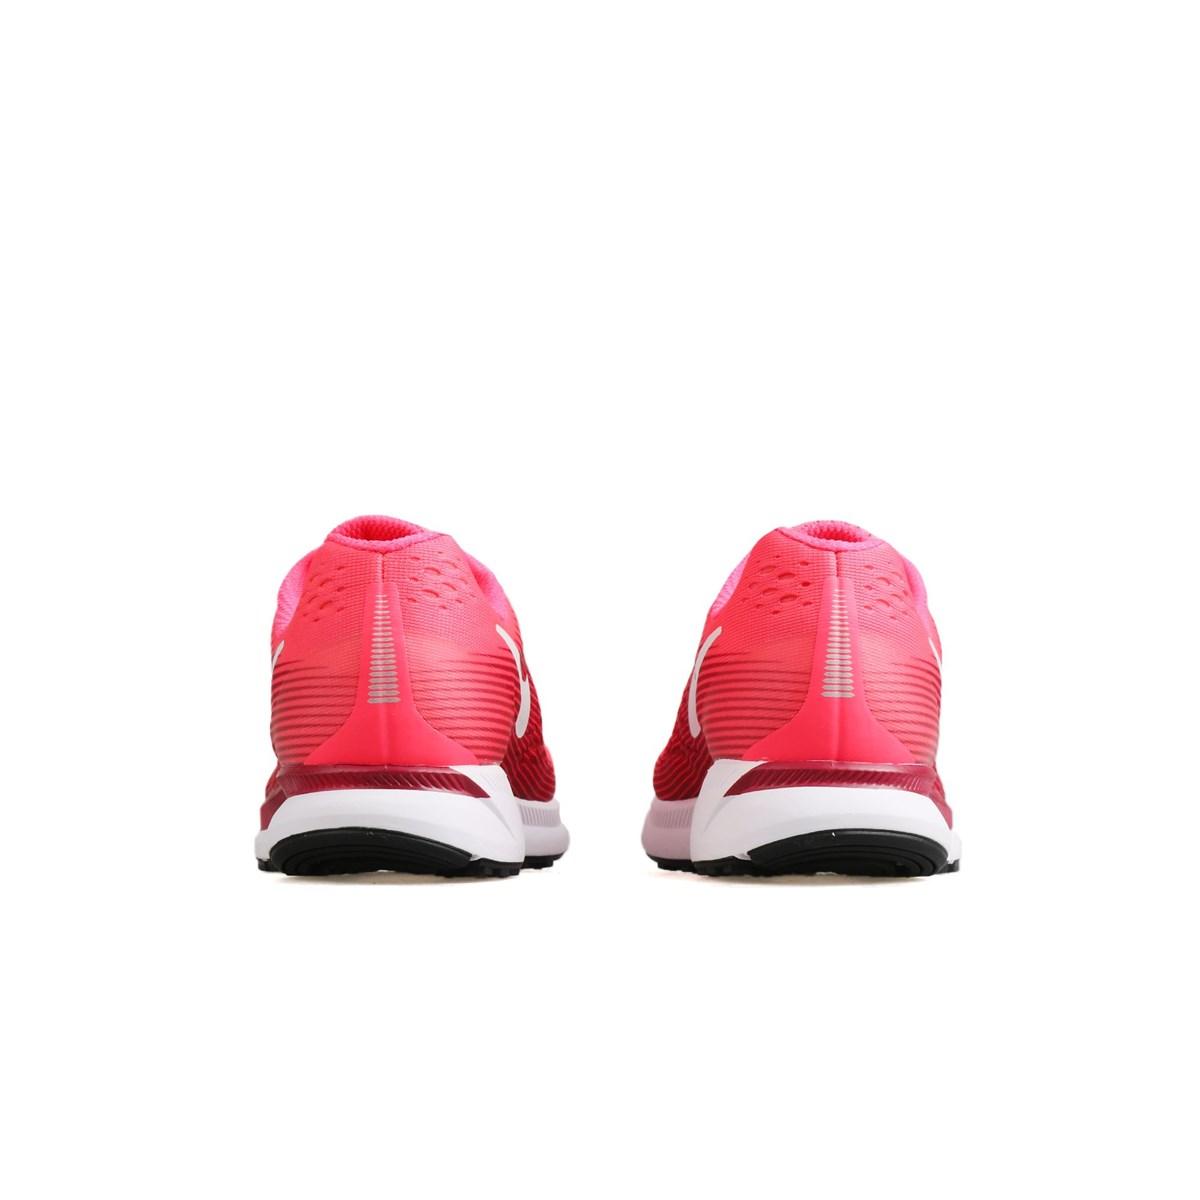 Air Zoom Pegasus 34 Kadın Pembe Koşu Ayakkabısı (880560-605)